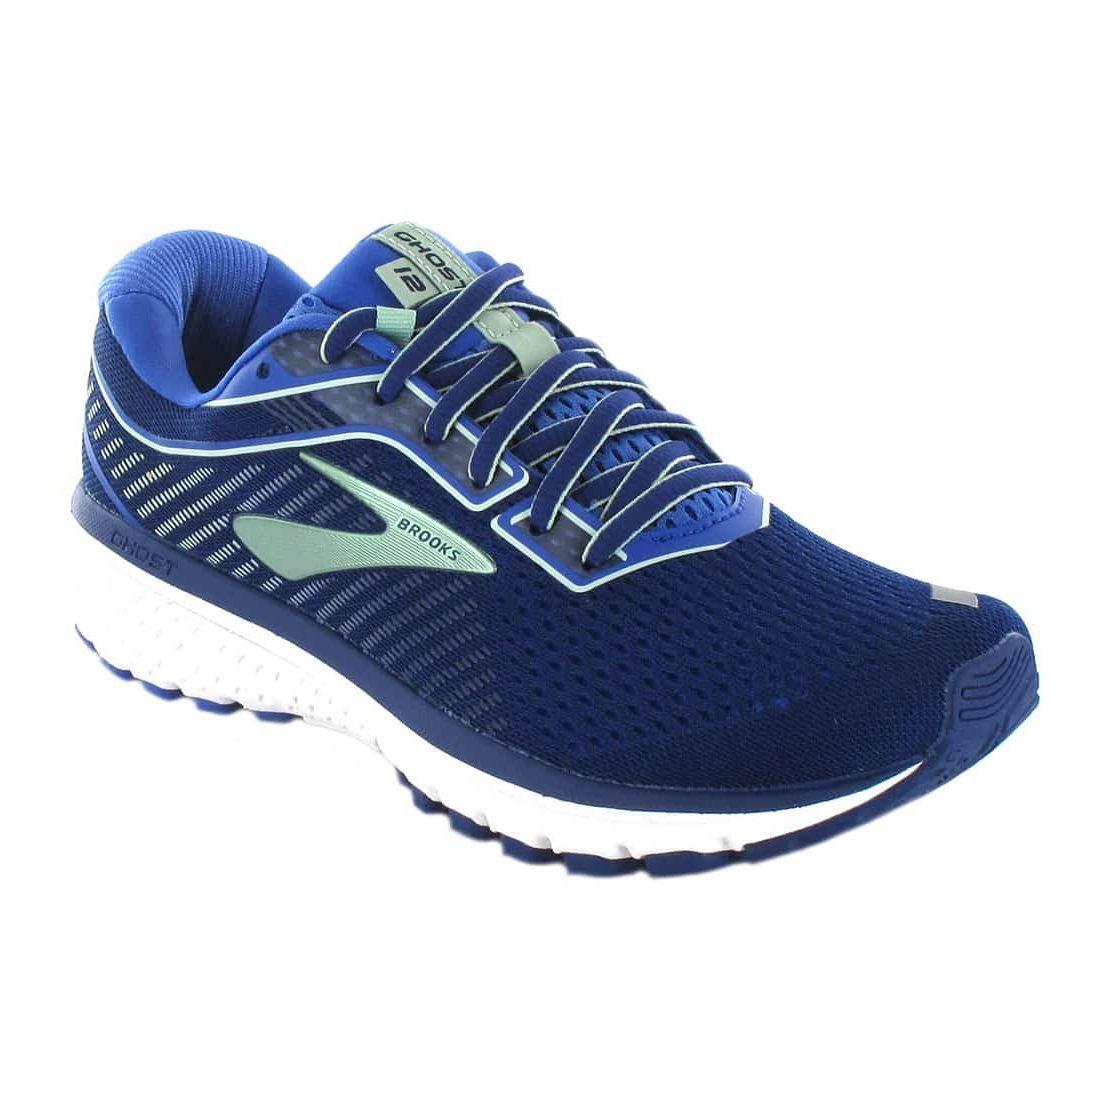 Zapatillas Running Hombre - Brooks Ghost 12 W Azul azul Zapatillas Running